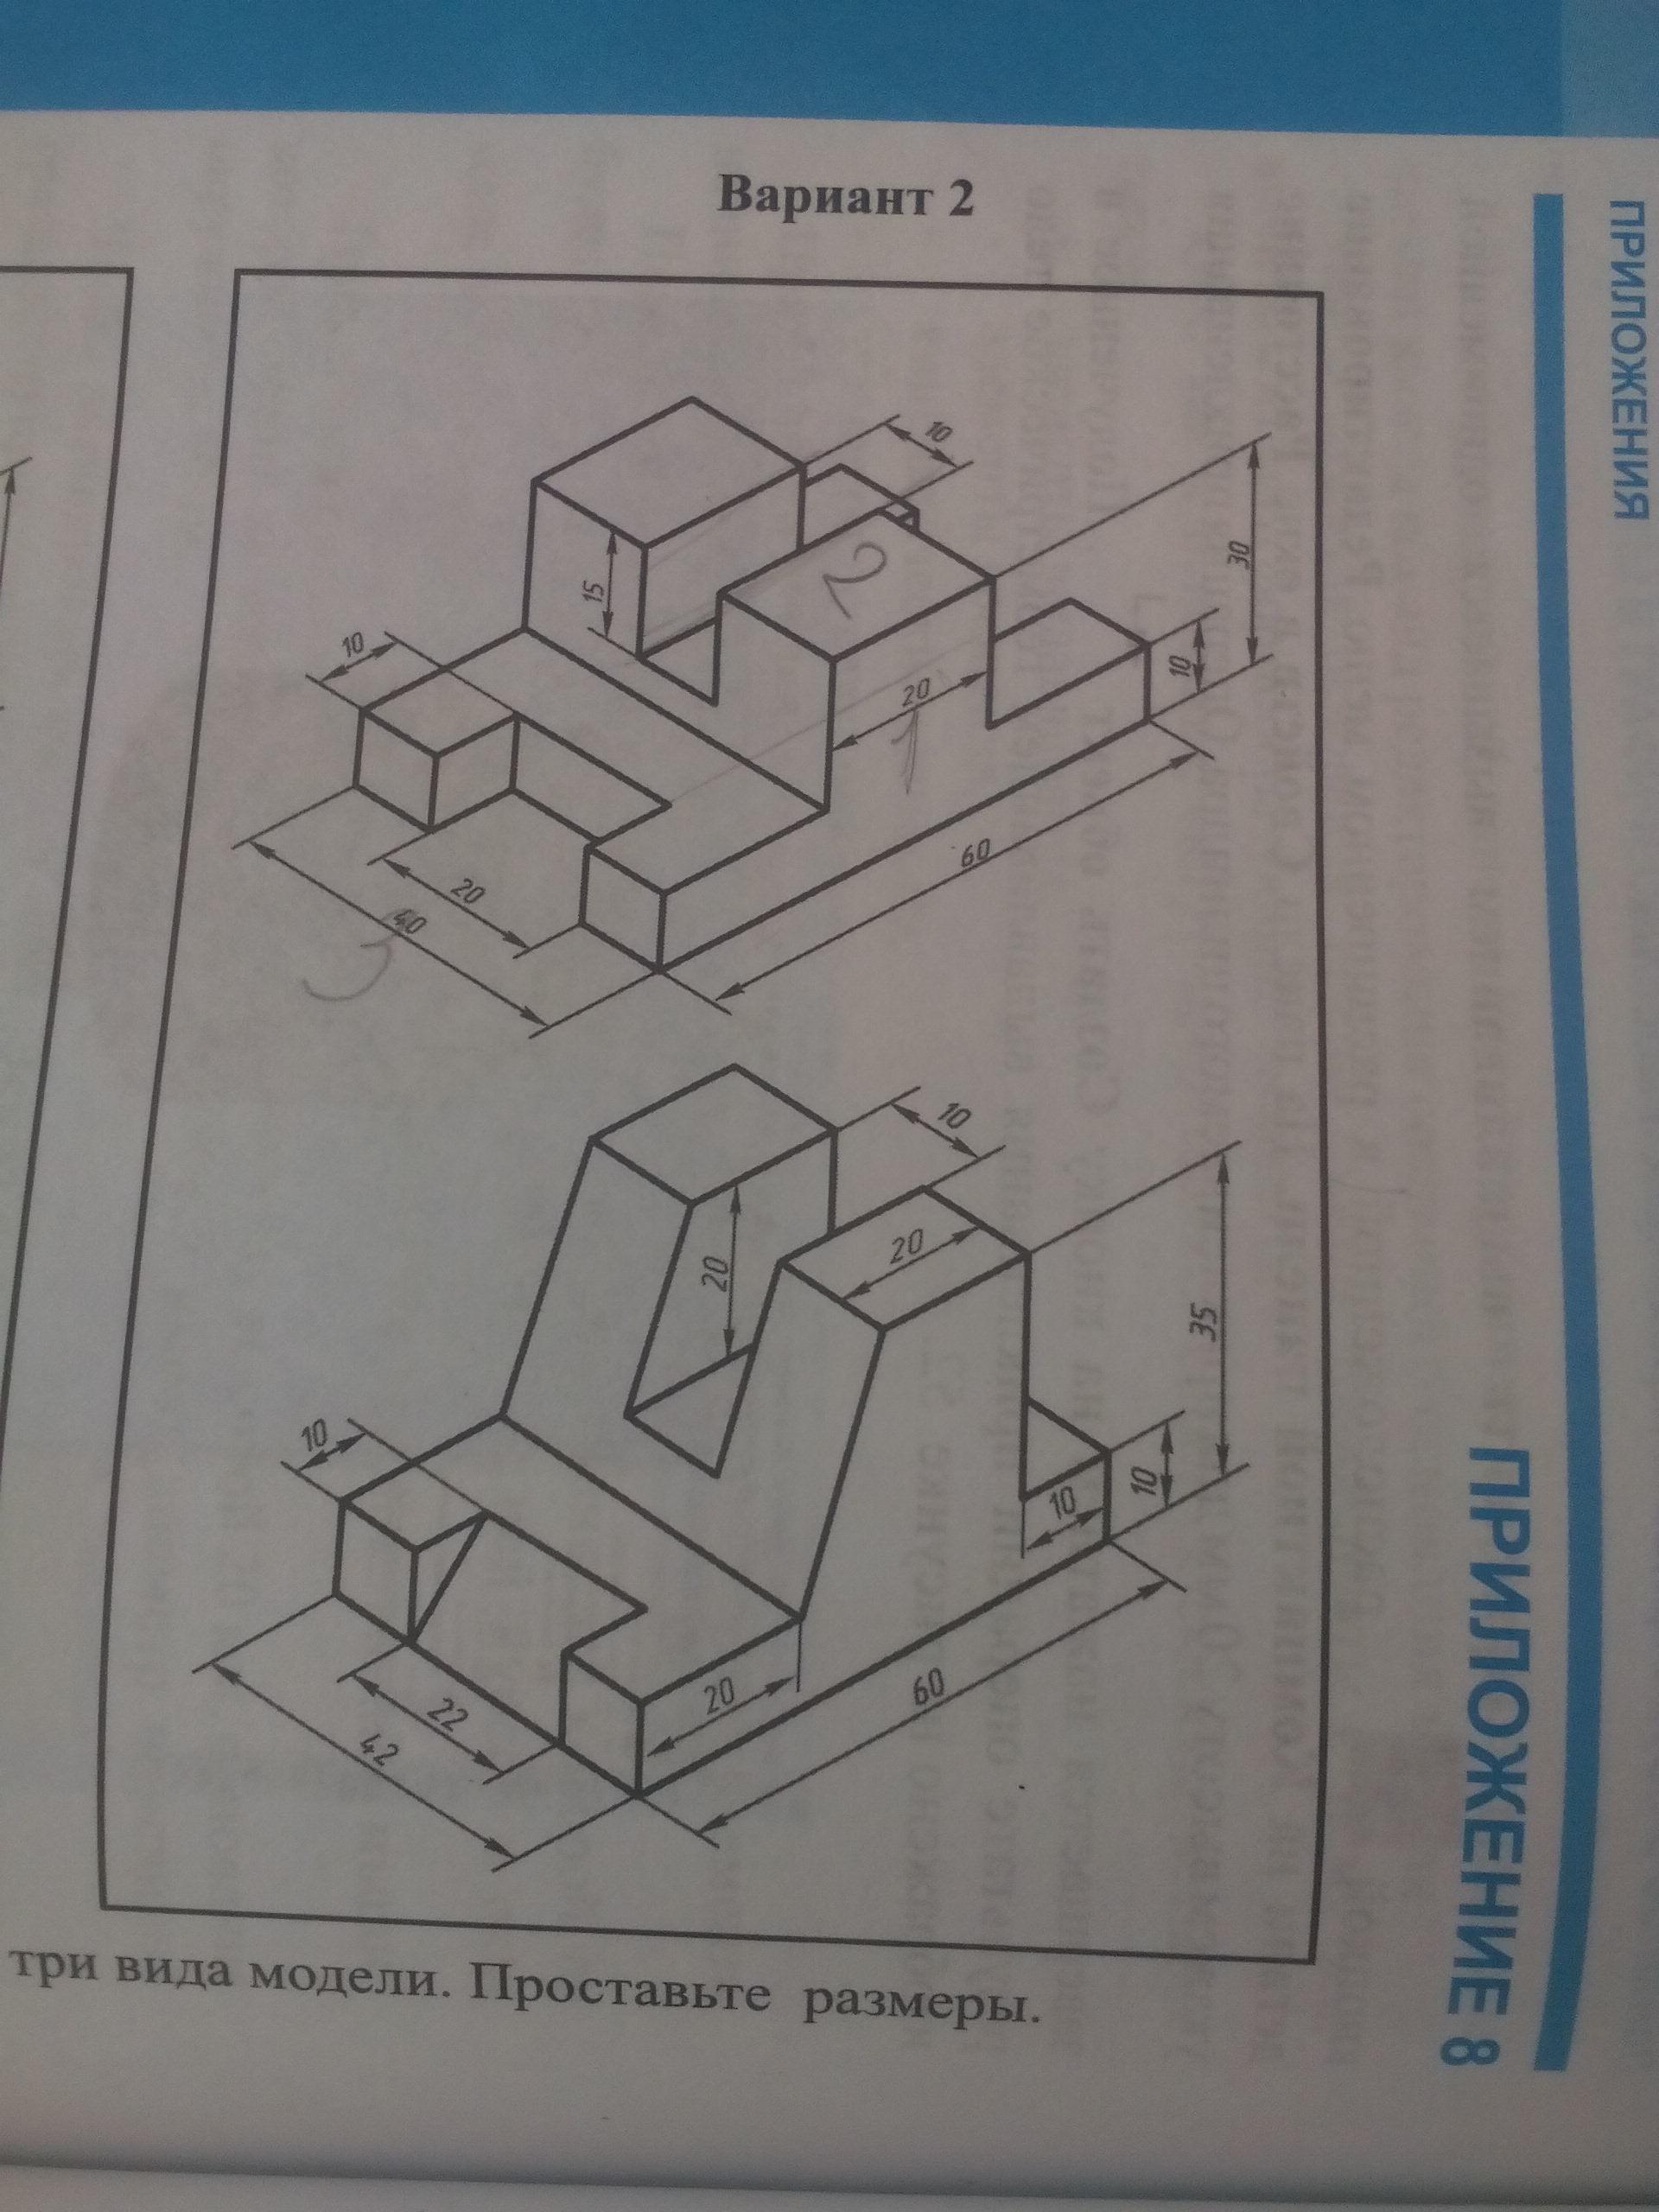 По аксонометрической проекции начертите 3 вида модели?